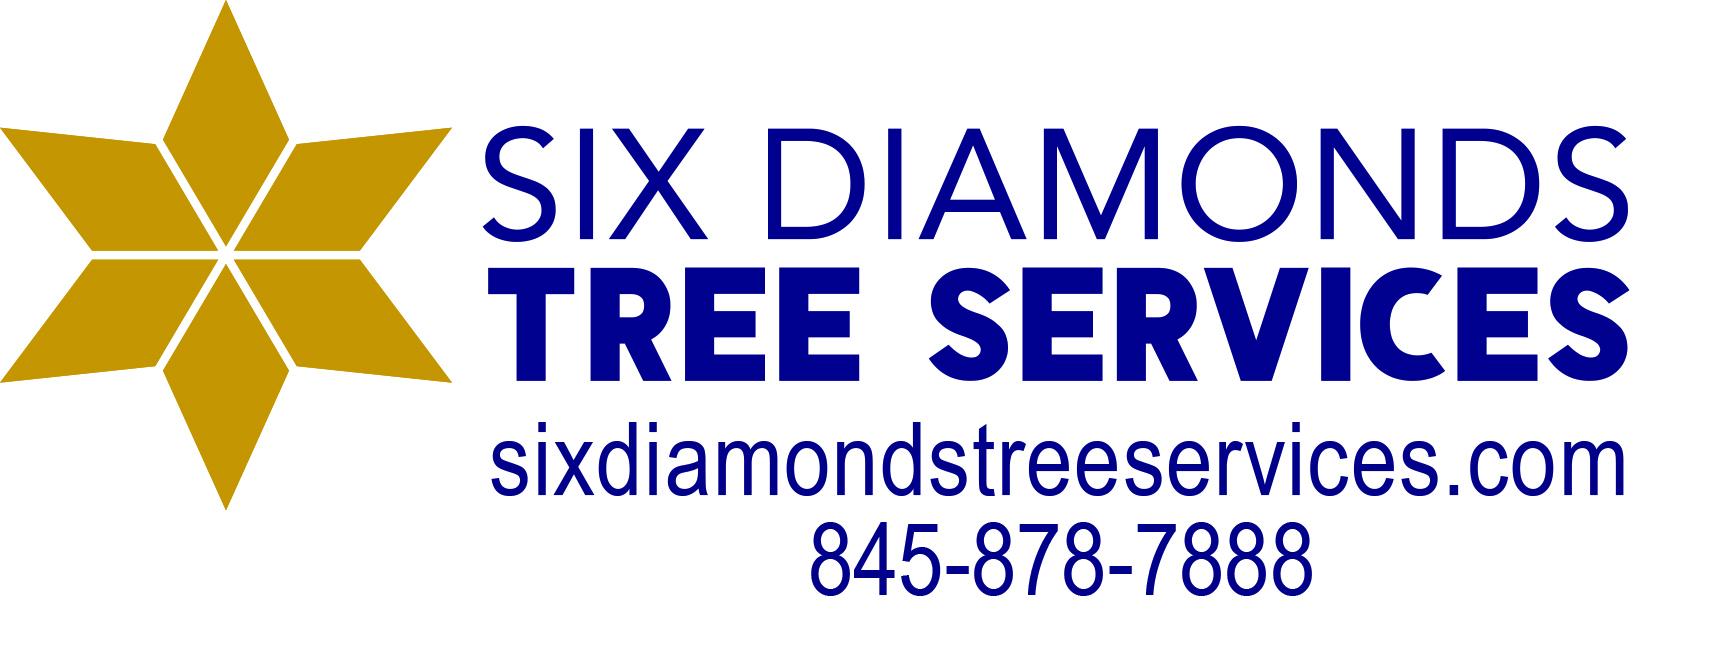 Six Diamonds Logo Contact Info